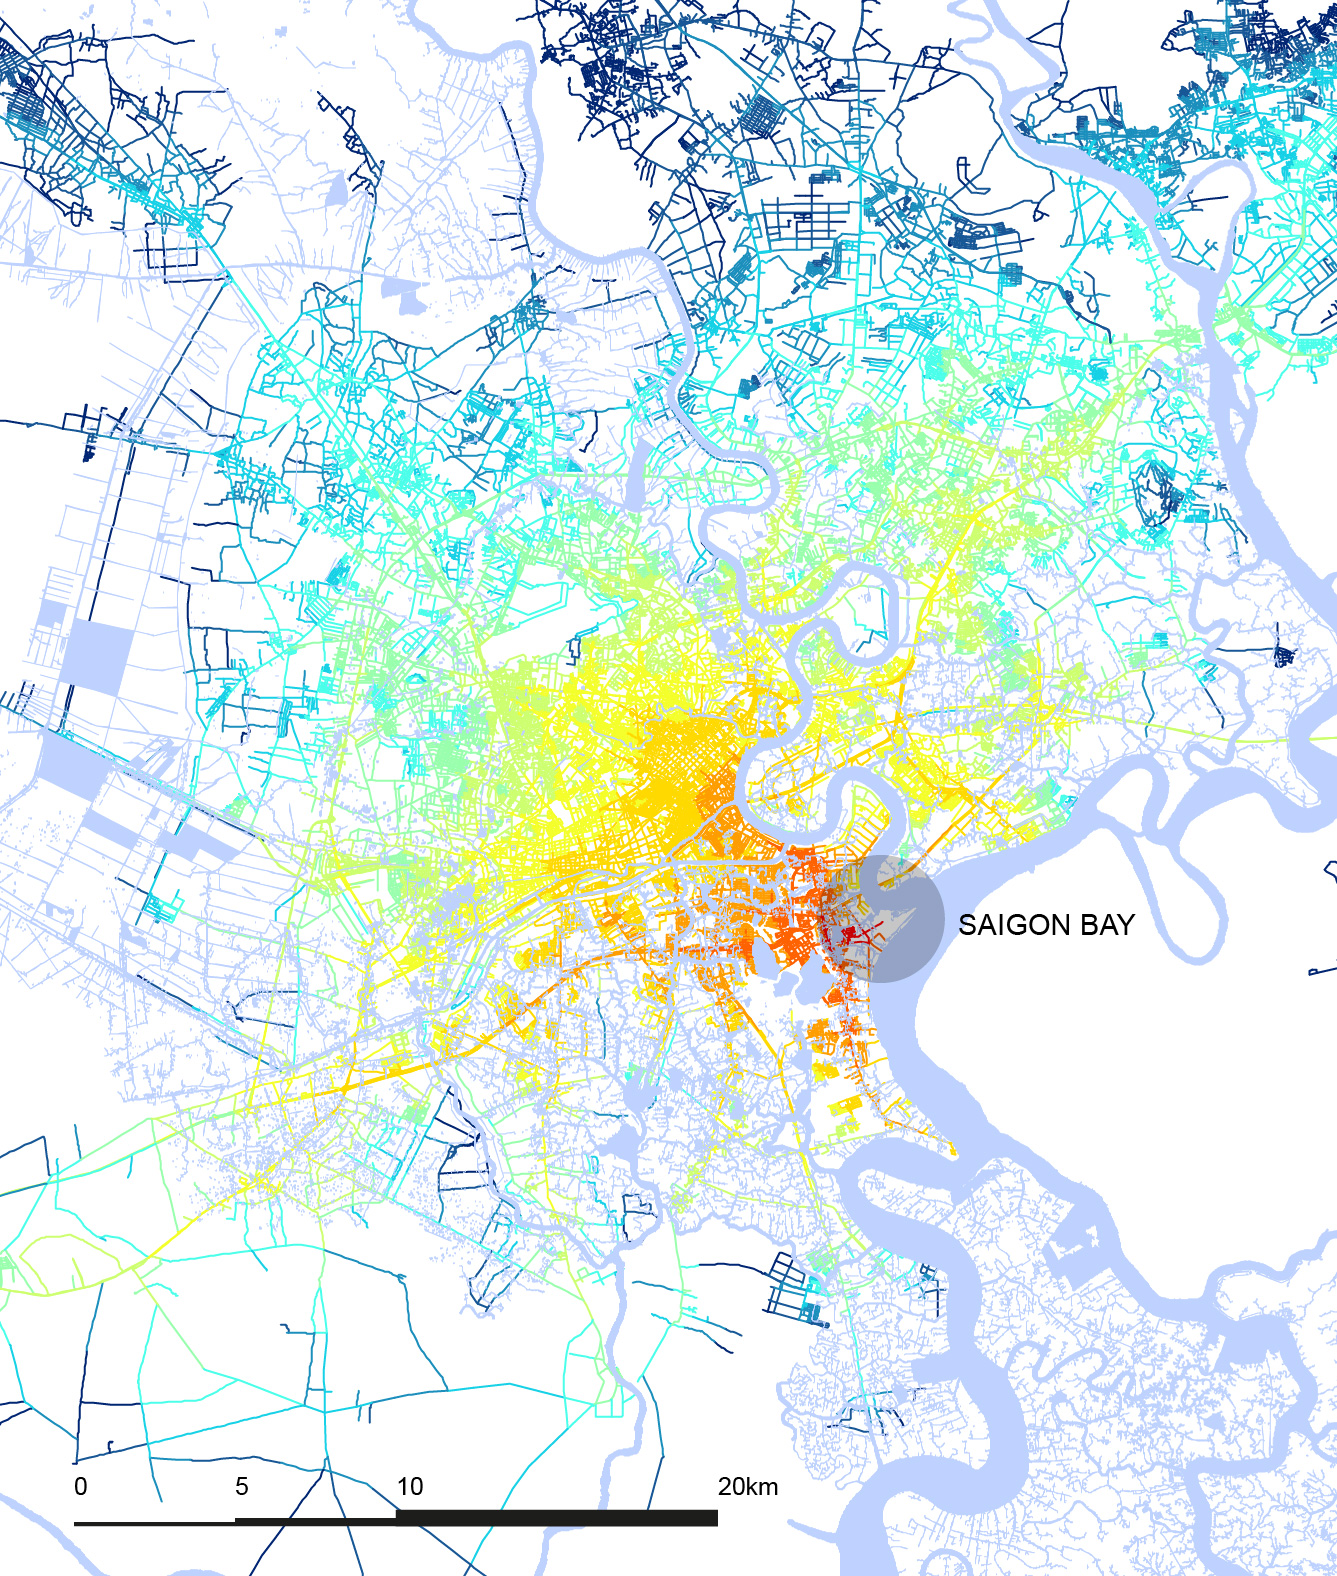 Saigon Peninsula Master Plan